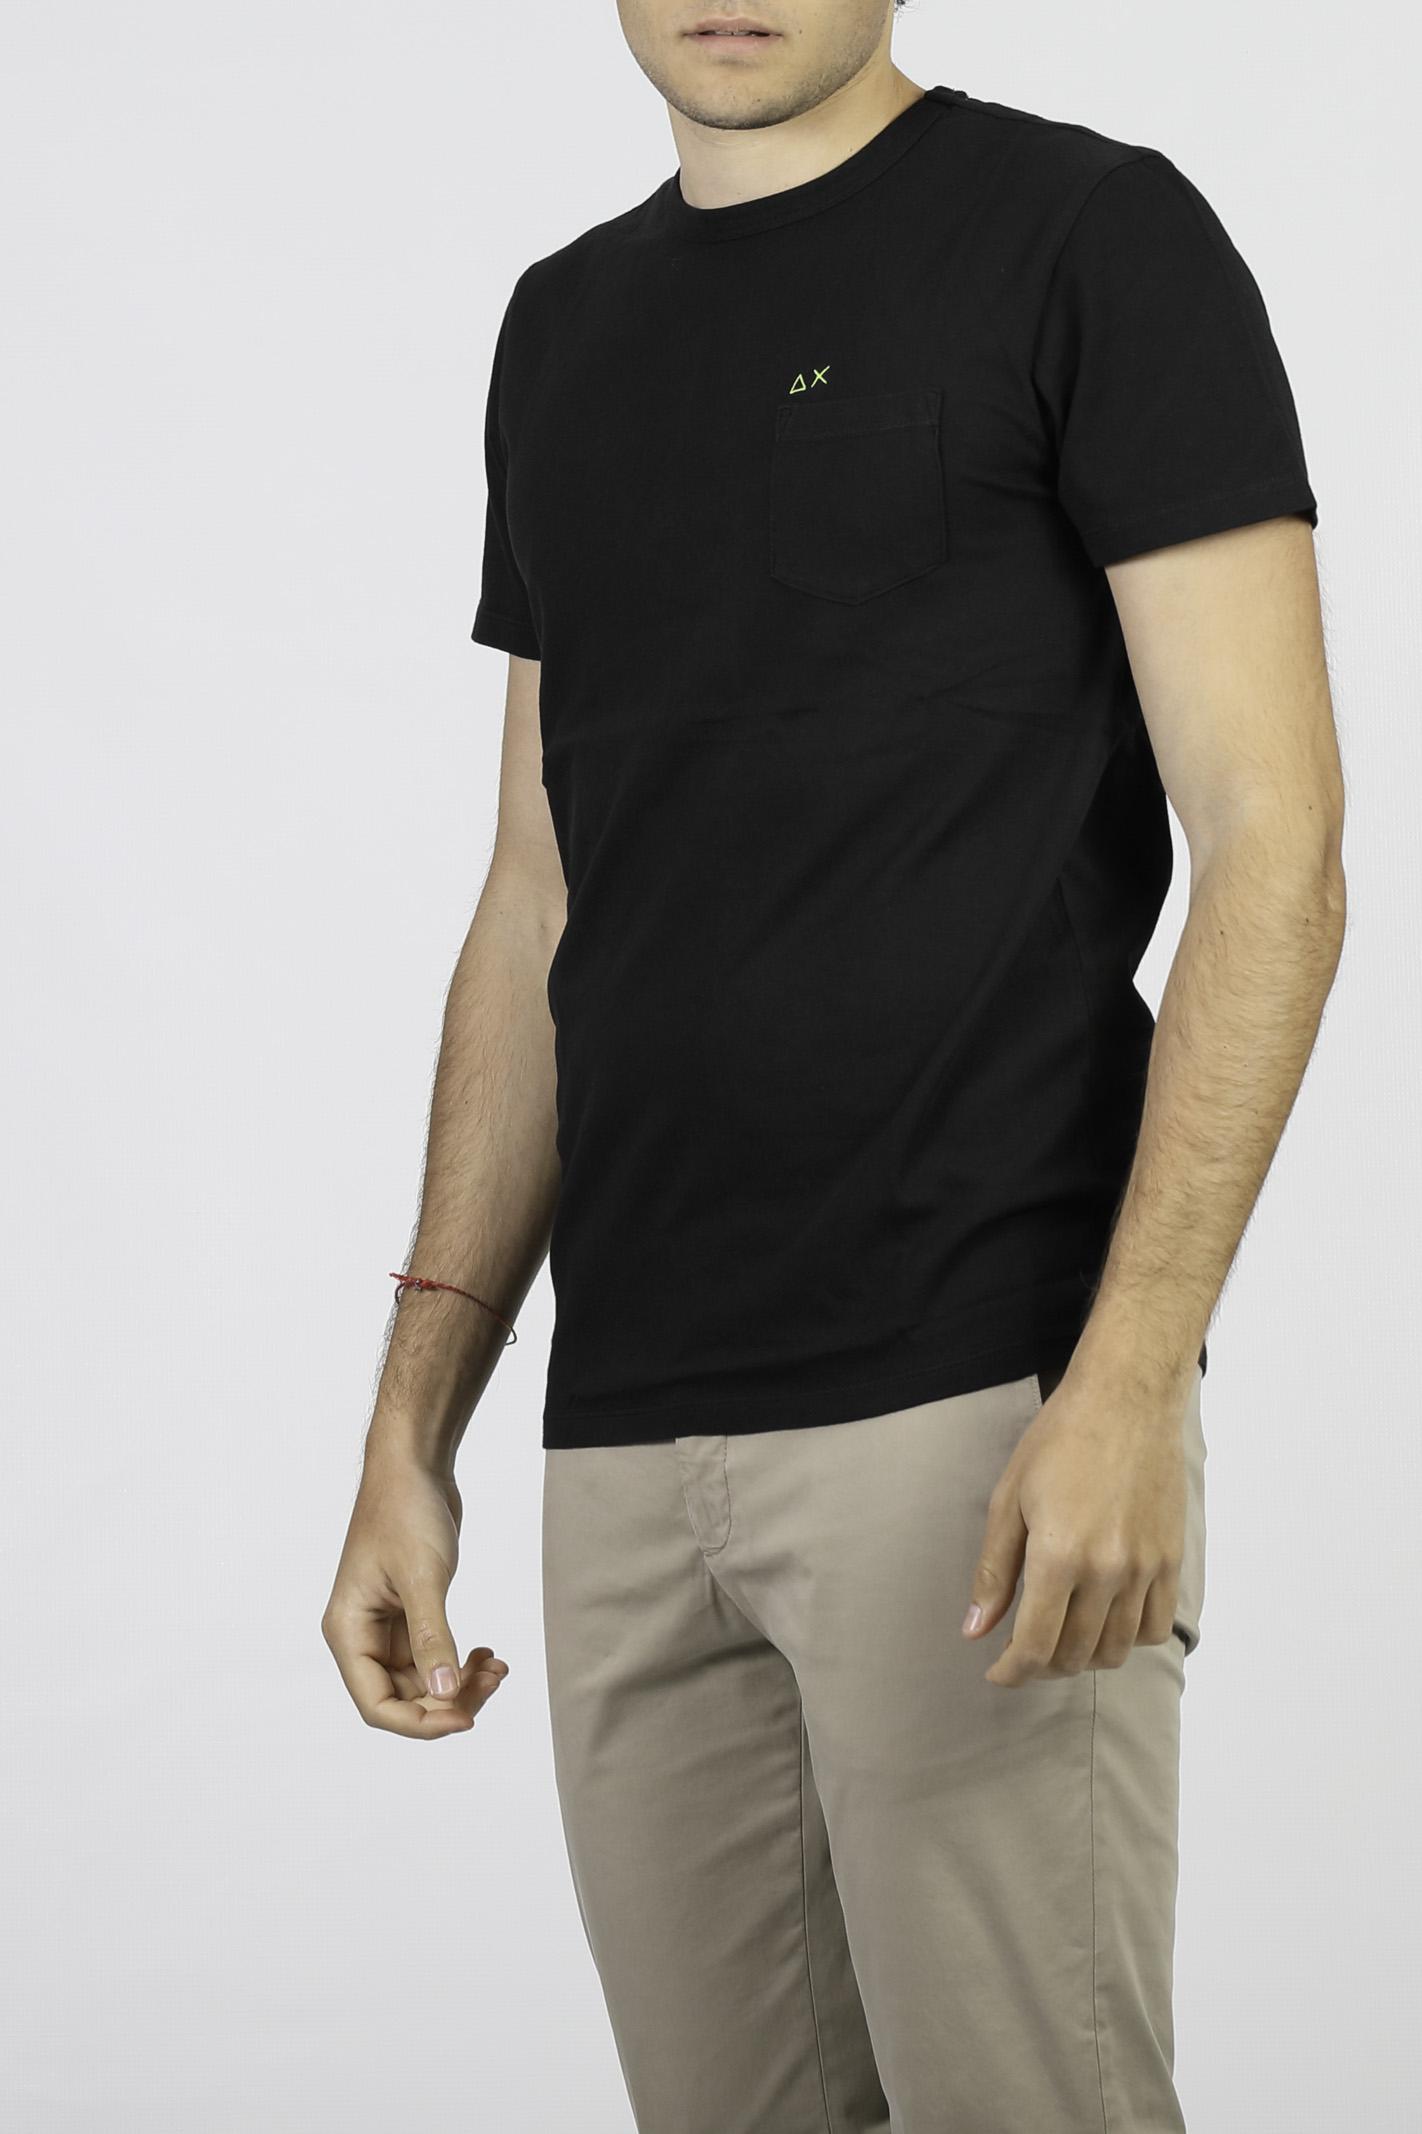 T-SHIRT IN COTONE SUN 68 | T-shirt | T3110111